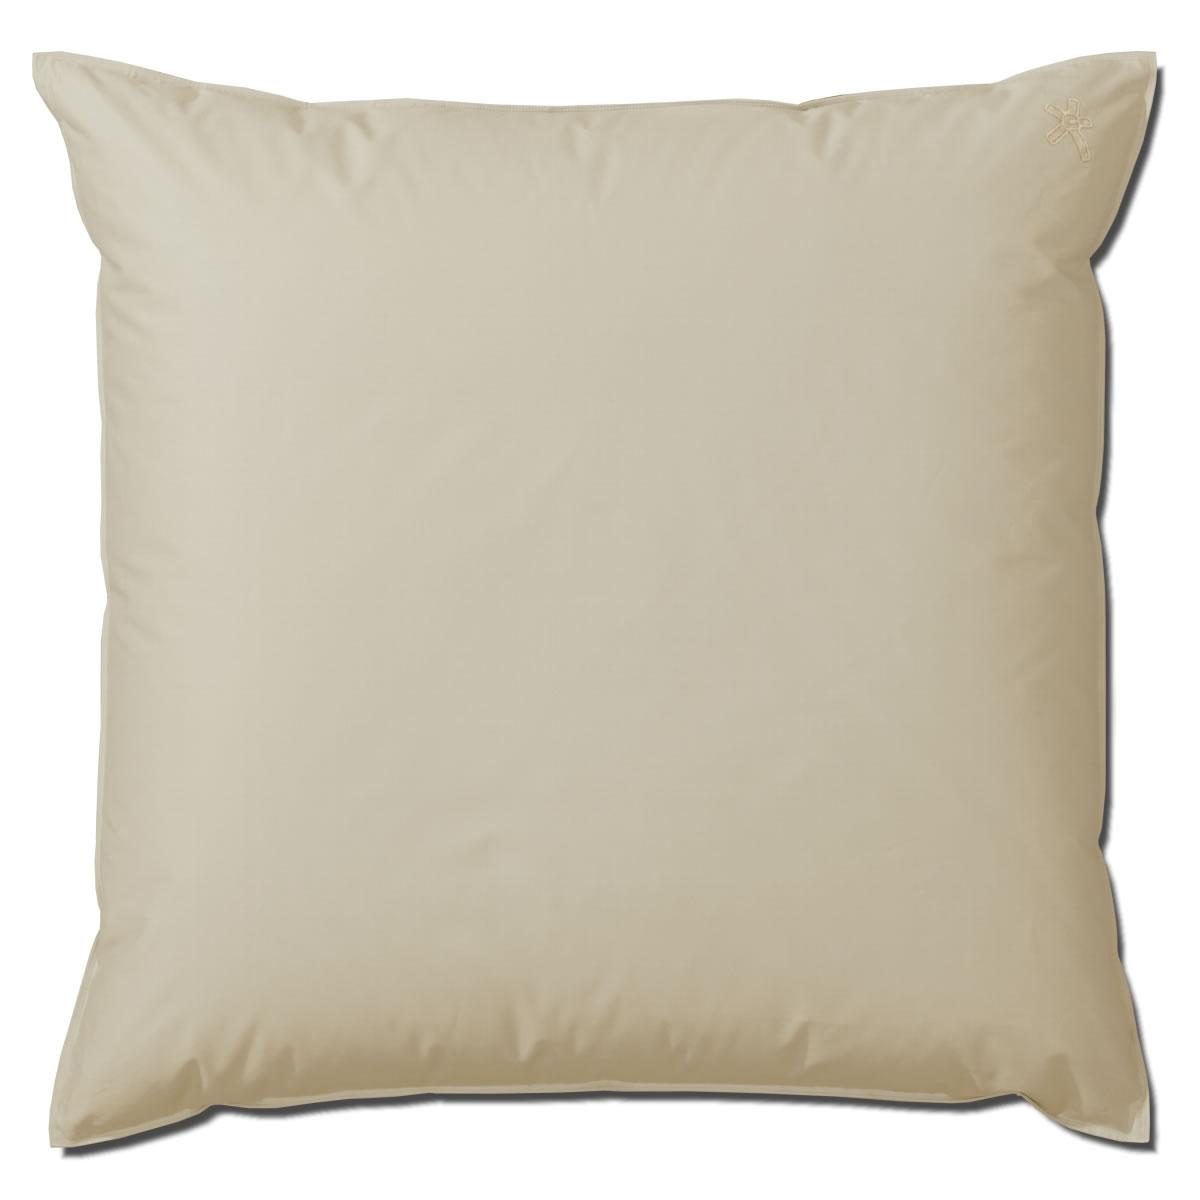 centa star extra golf von alaska kissen medium kopfkissen 70 federn. Black Bedroom Furniture Sets. Home Design Ideas